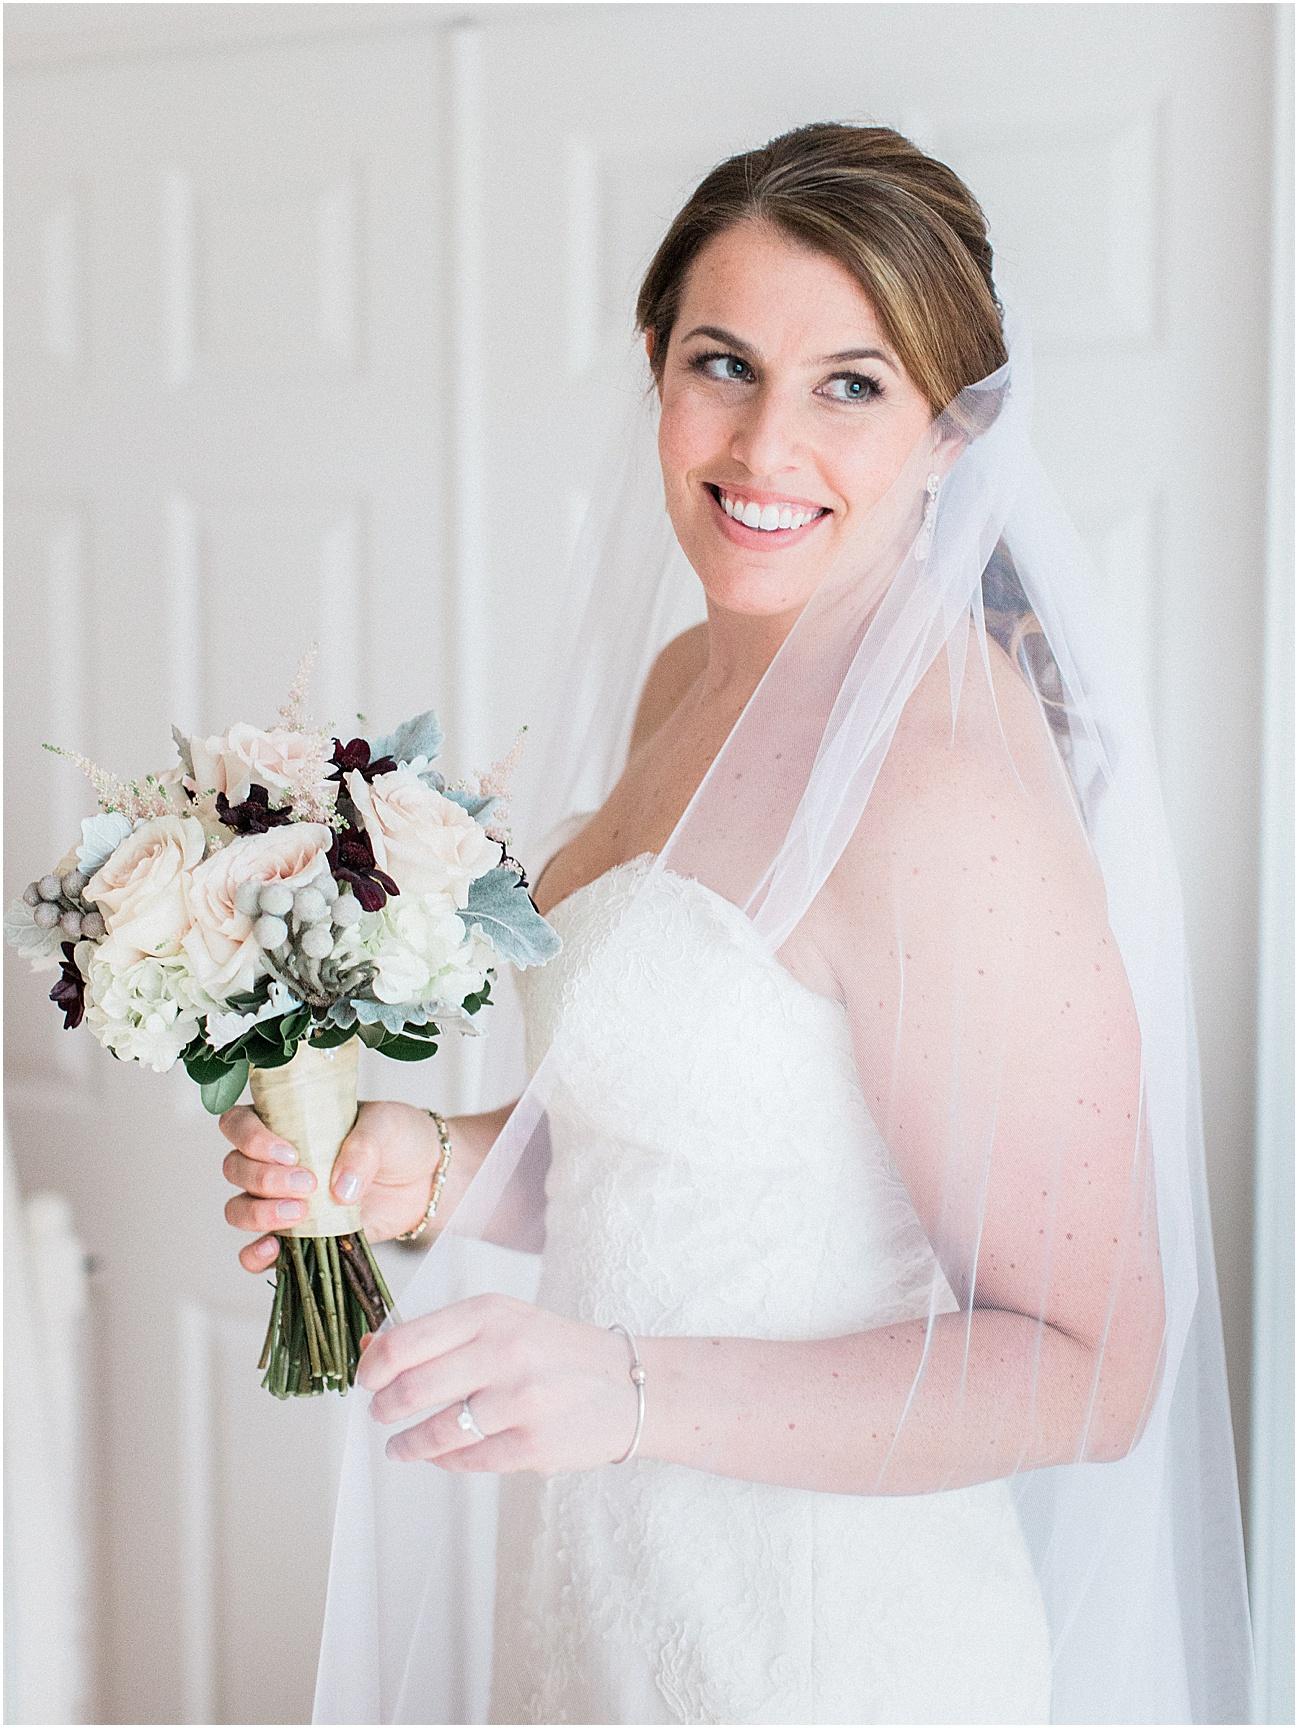 danielle_sean_willowbend_rain_rainy_day_cape_cod_boston_wedding_photographer_meredith_jane_photography_photo_1665.jpg